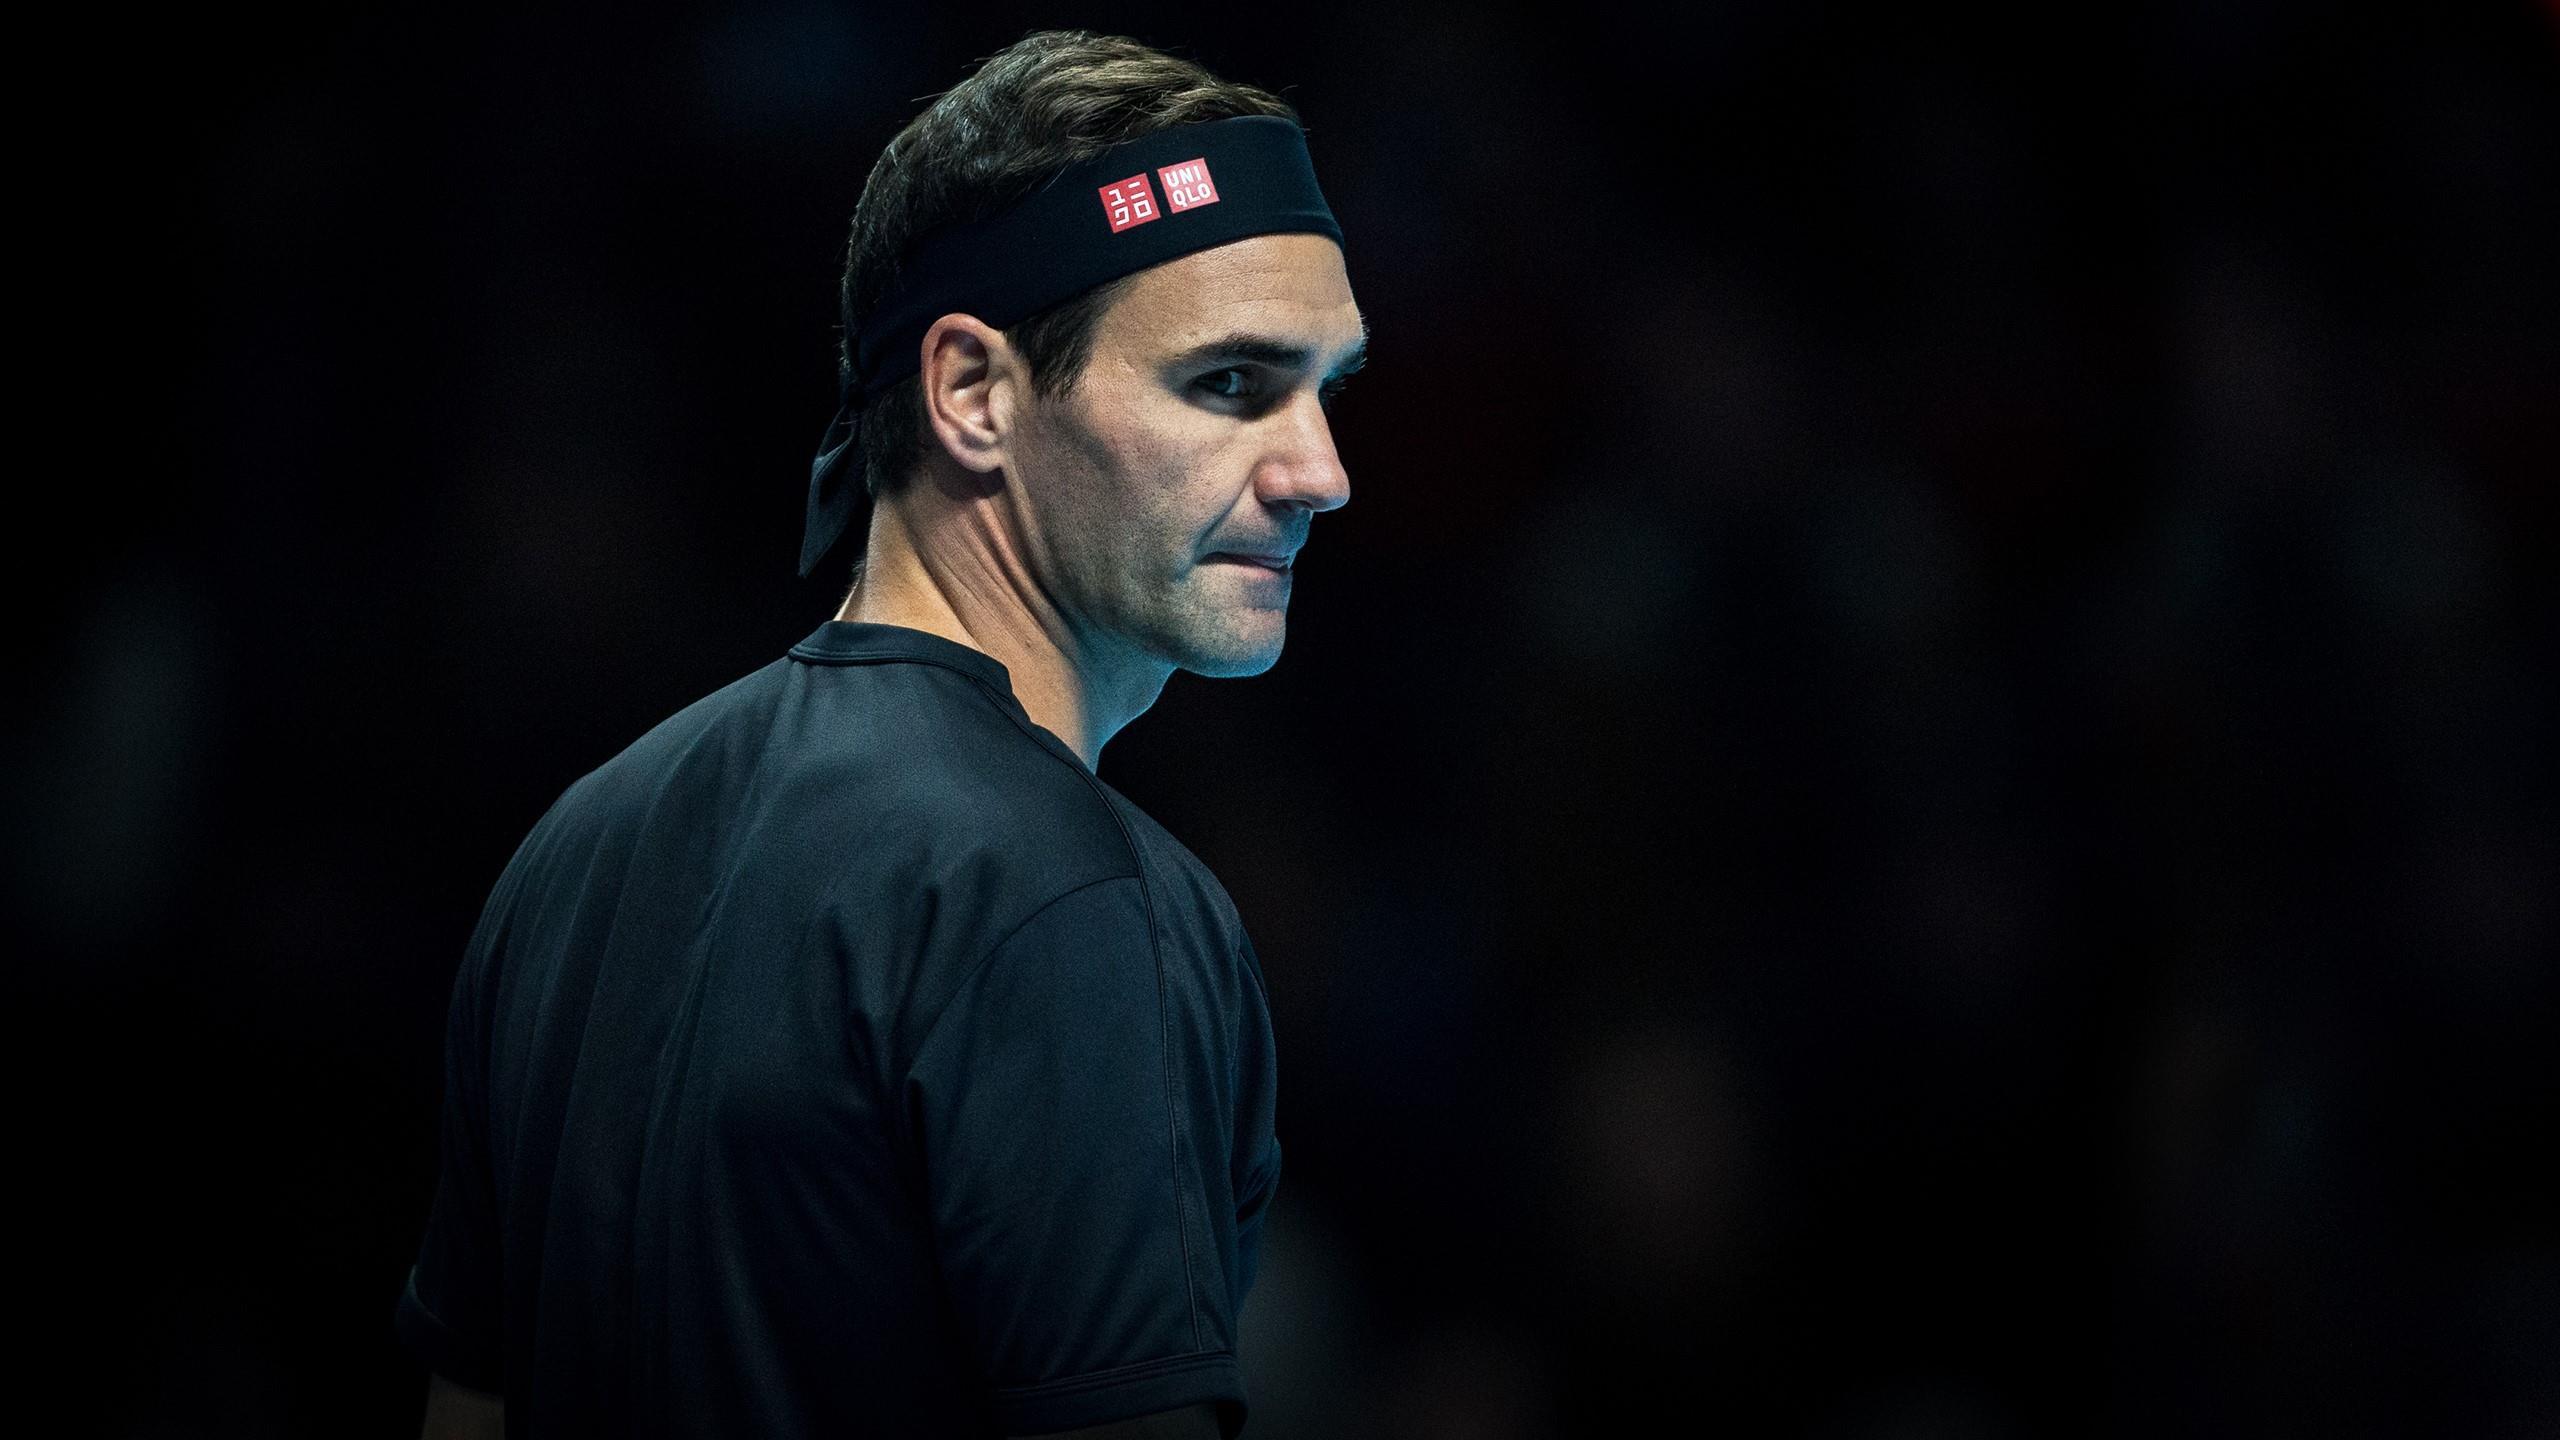 Roger Federer: Rainer Schüttler exklusiv über das Comeback des Superstars - Eurosport DE